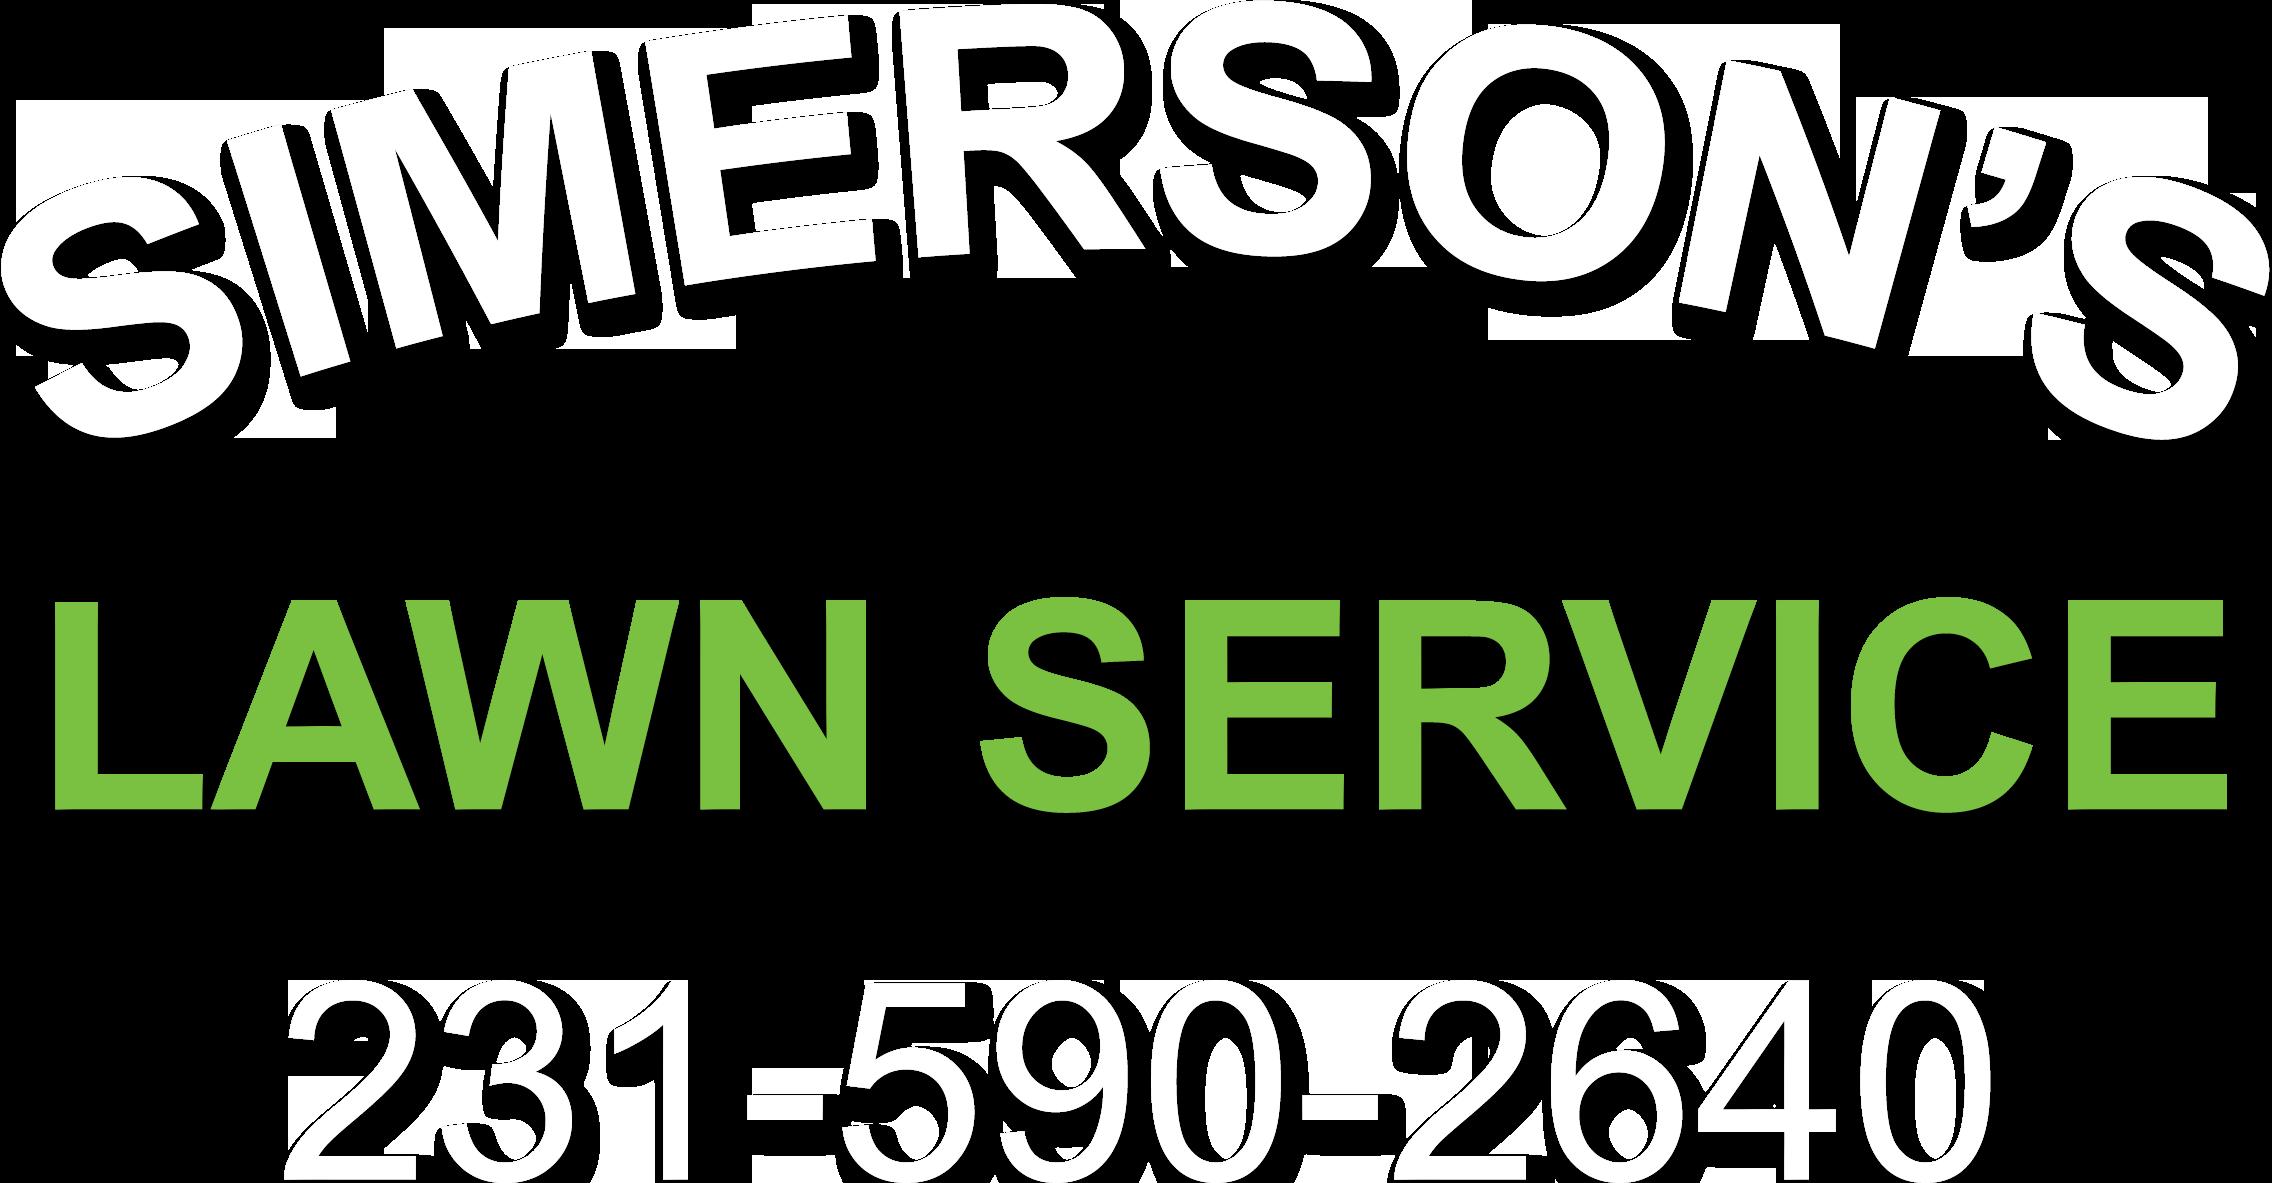 Simerson's Lawn Service